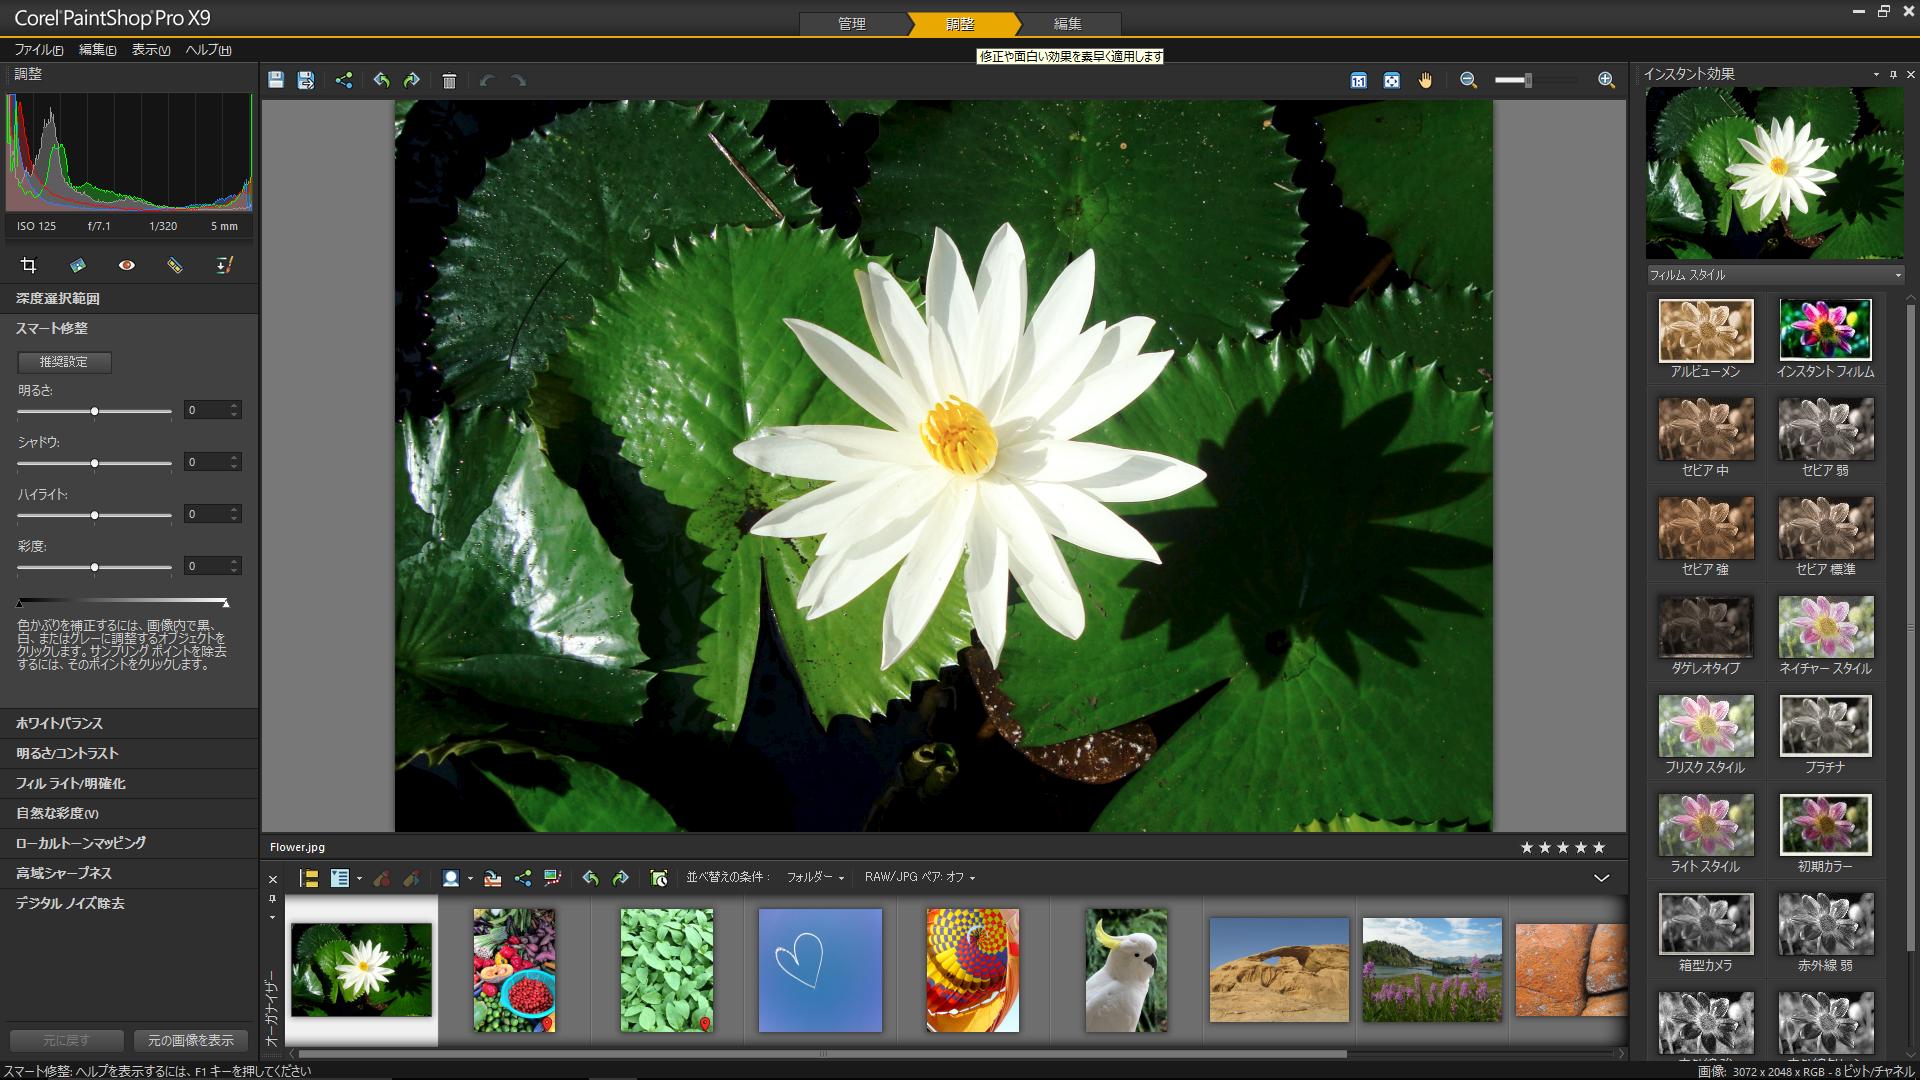 PaintShop Pro X9の「調整」ワークフロー画面